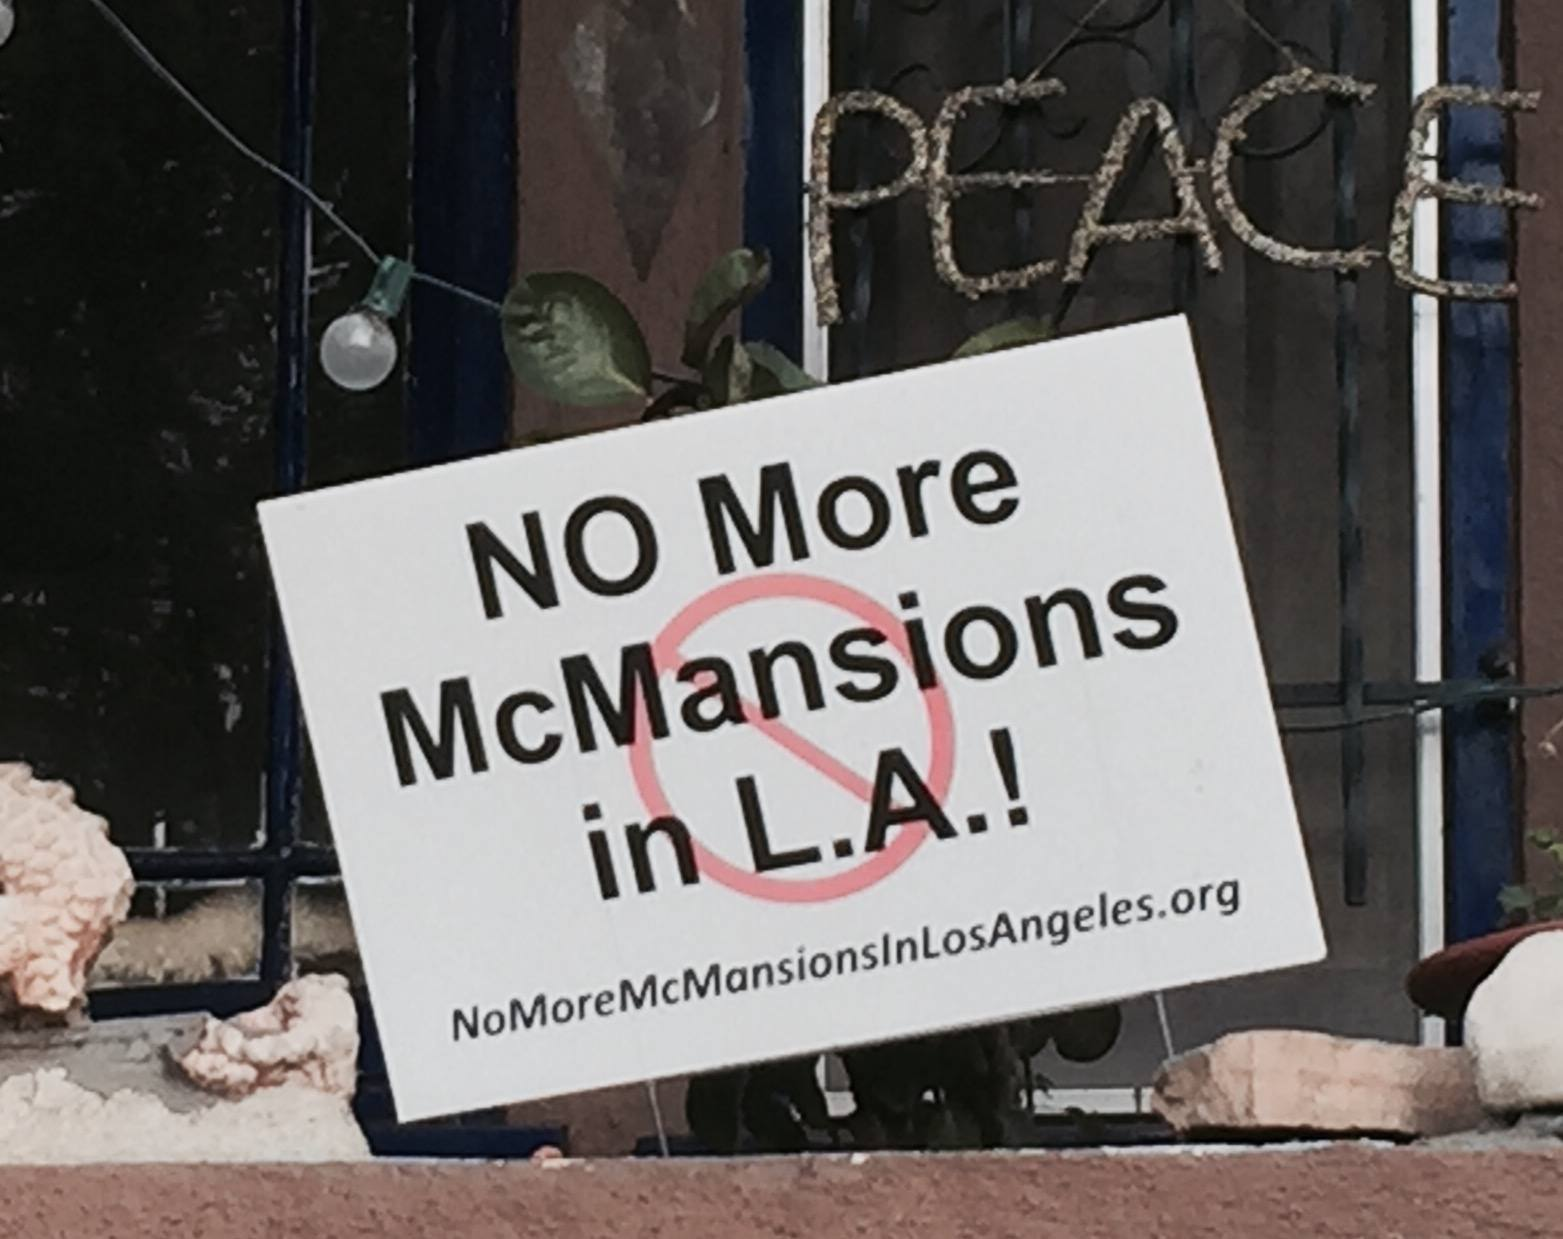 NoMoMcMansions